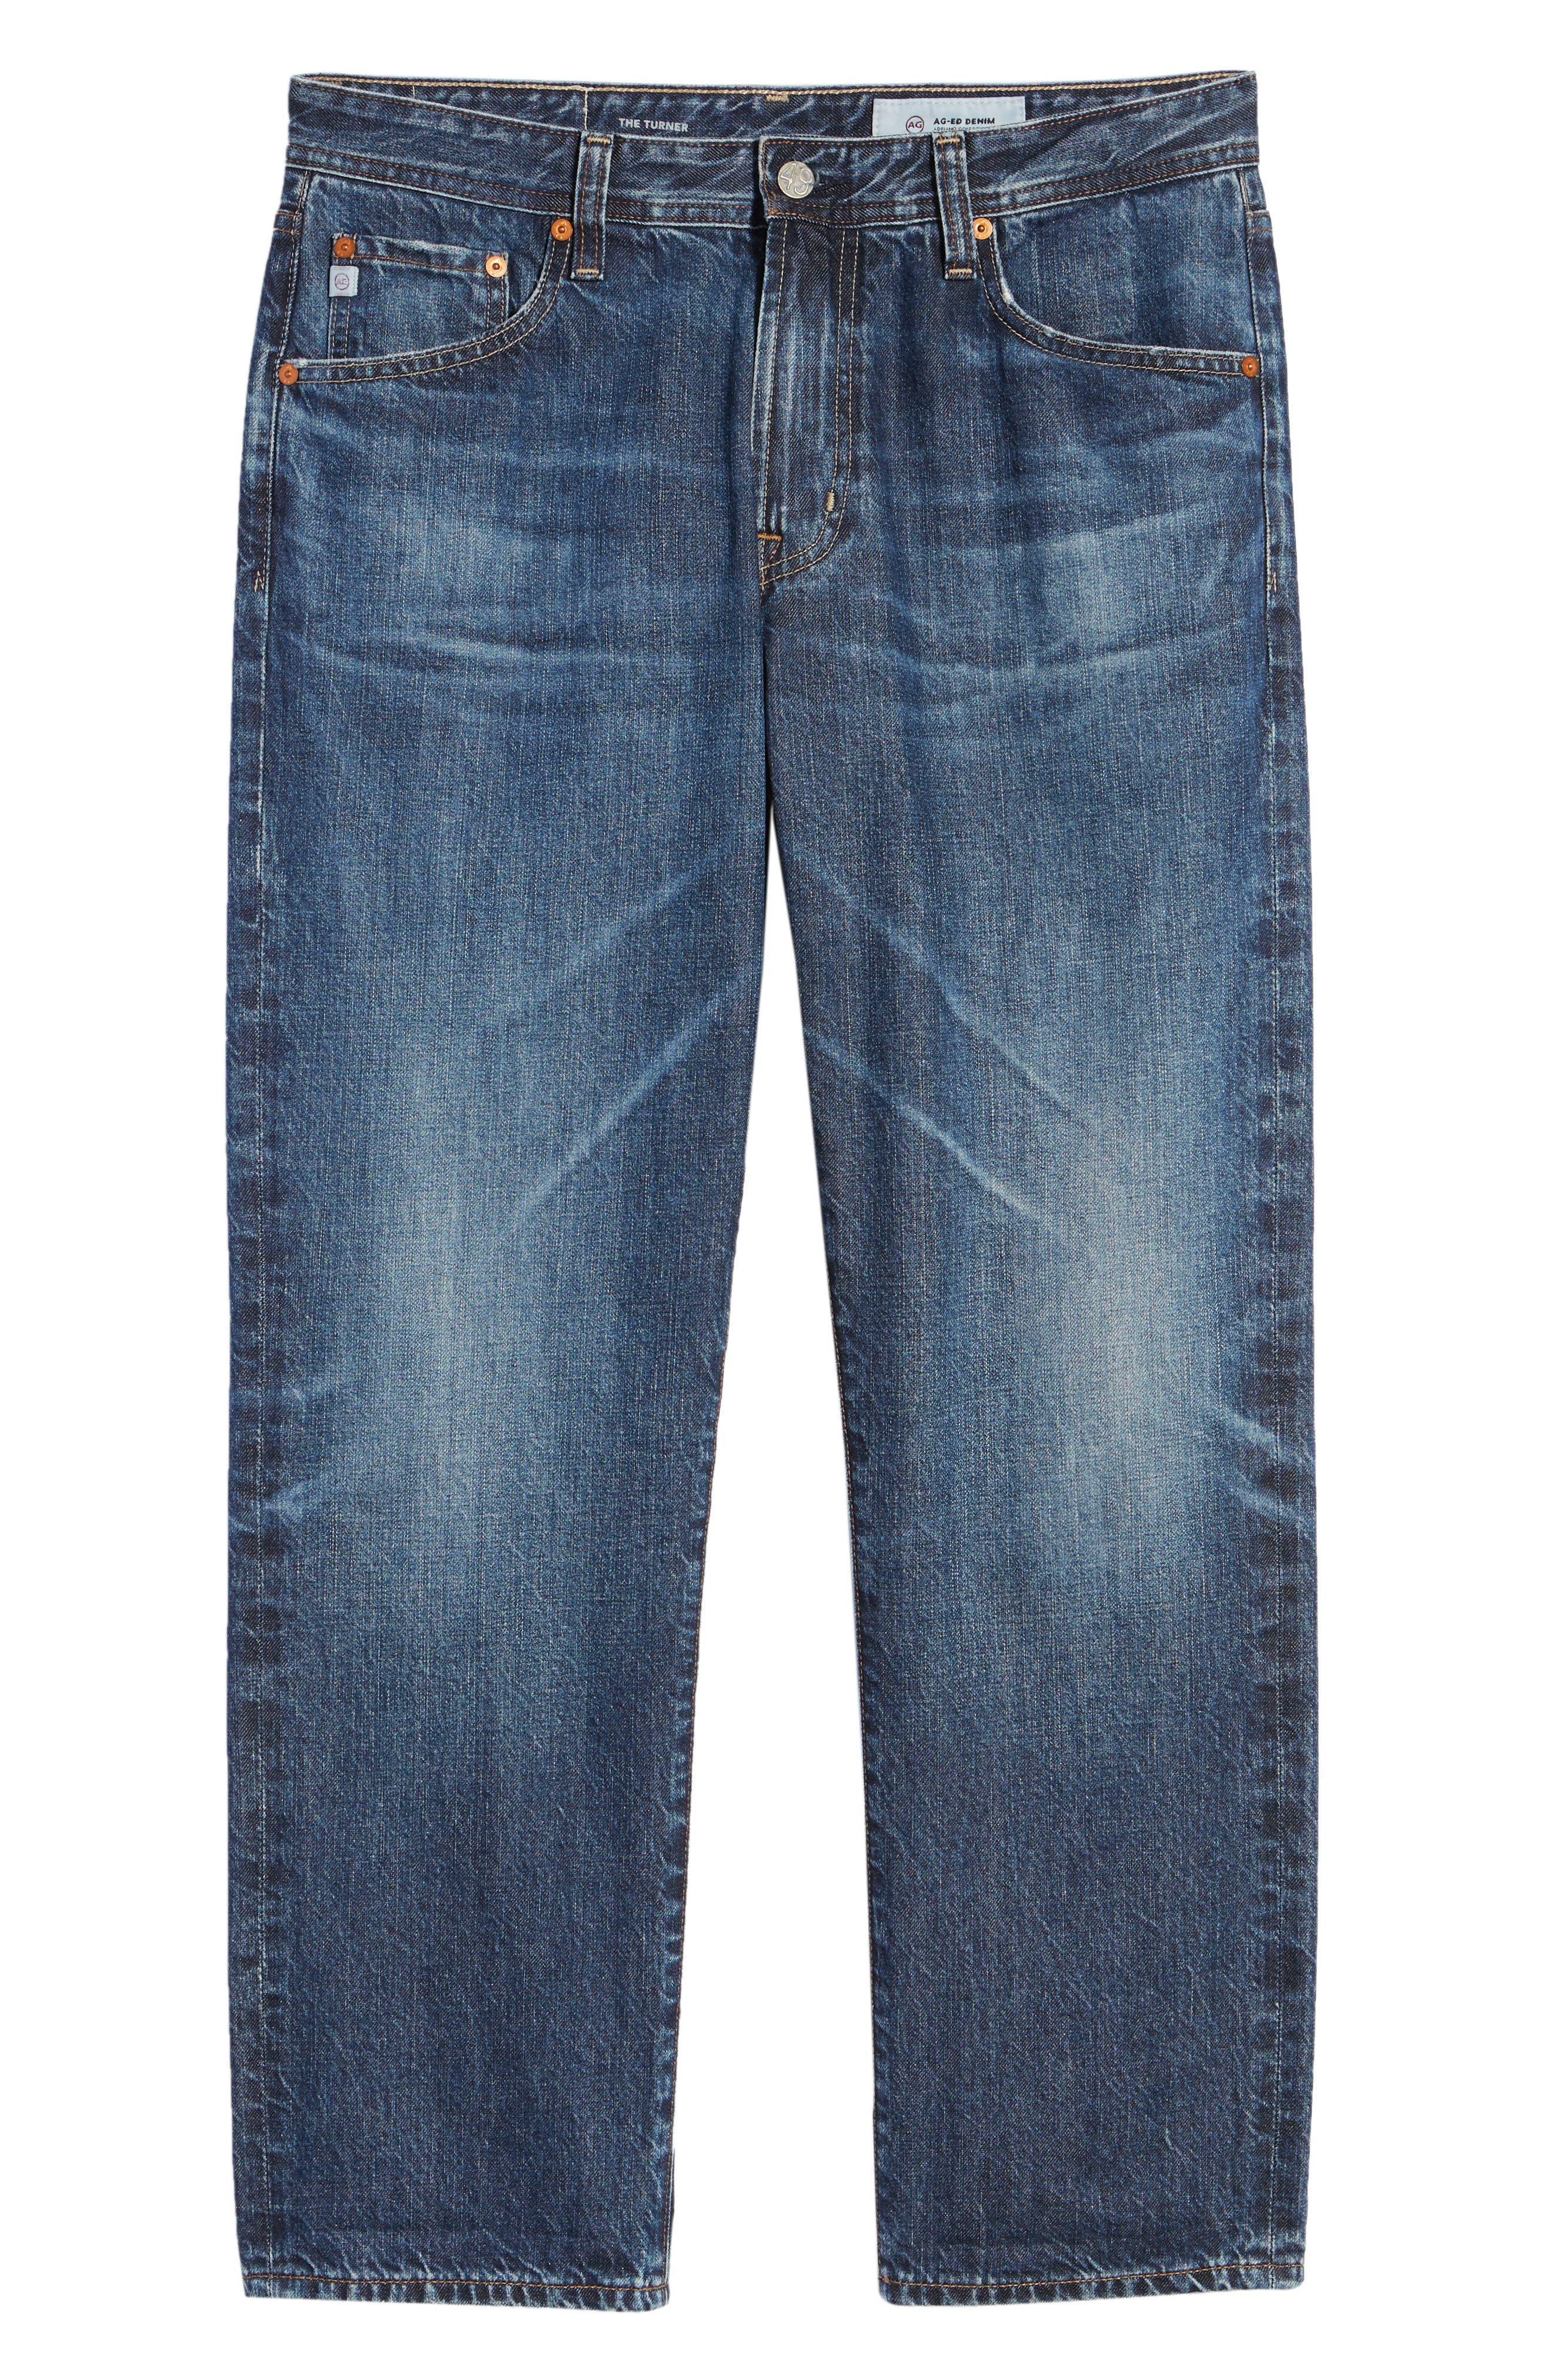 Turner Crop Jeans,                             Alternate thumbnail 6, color,                             5 YEARS WAYFARER